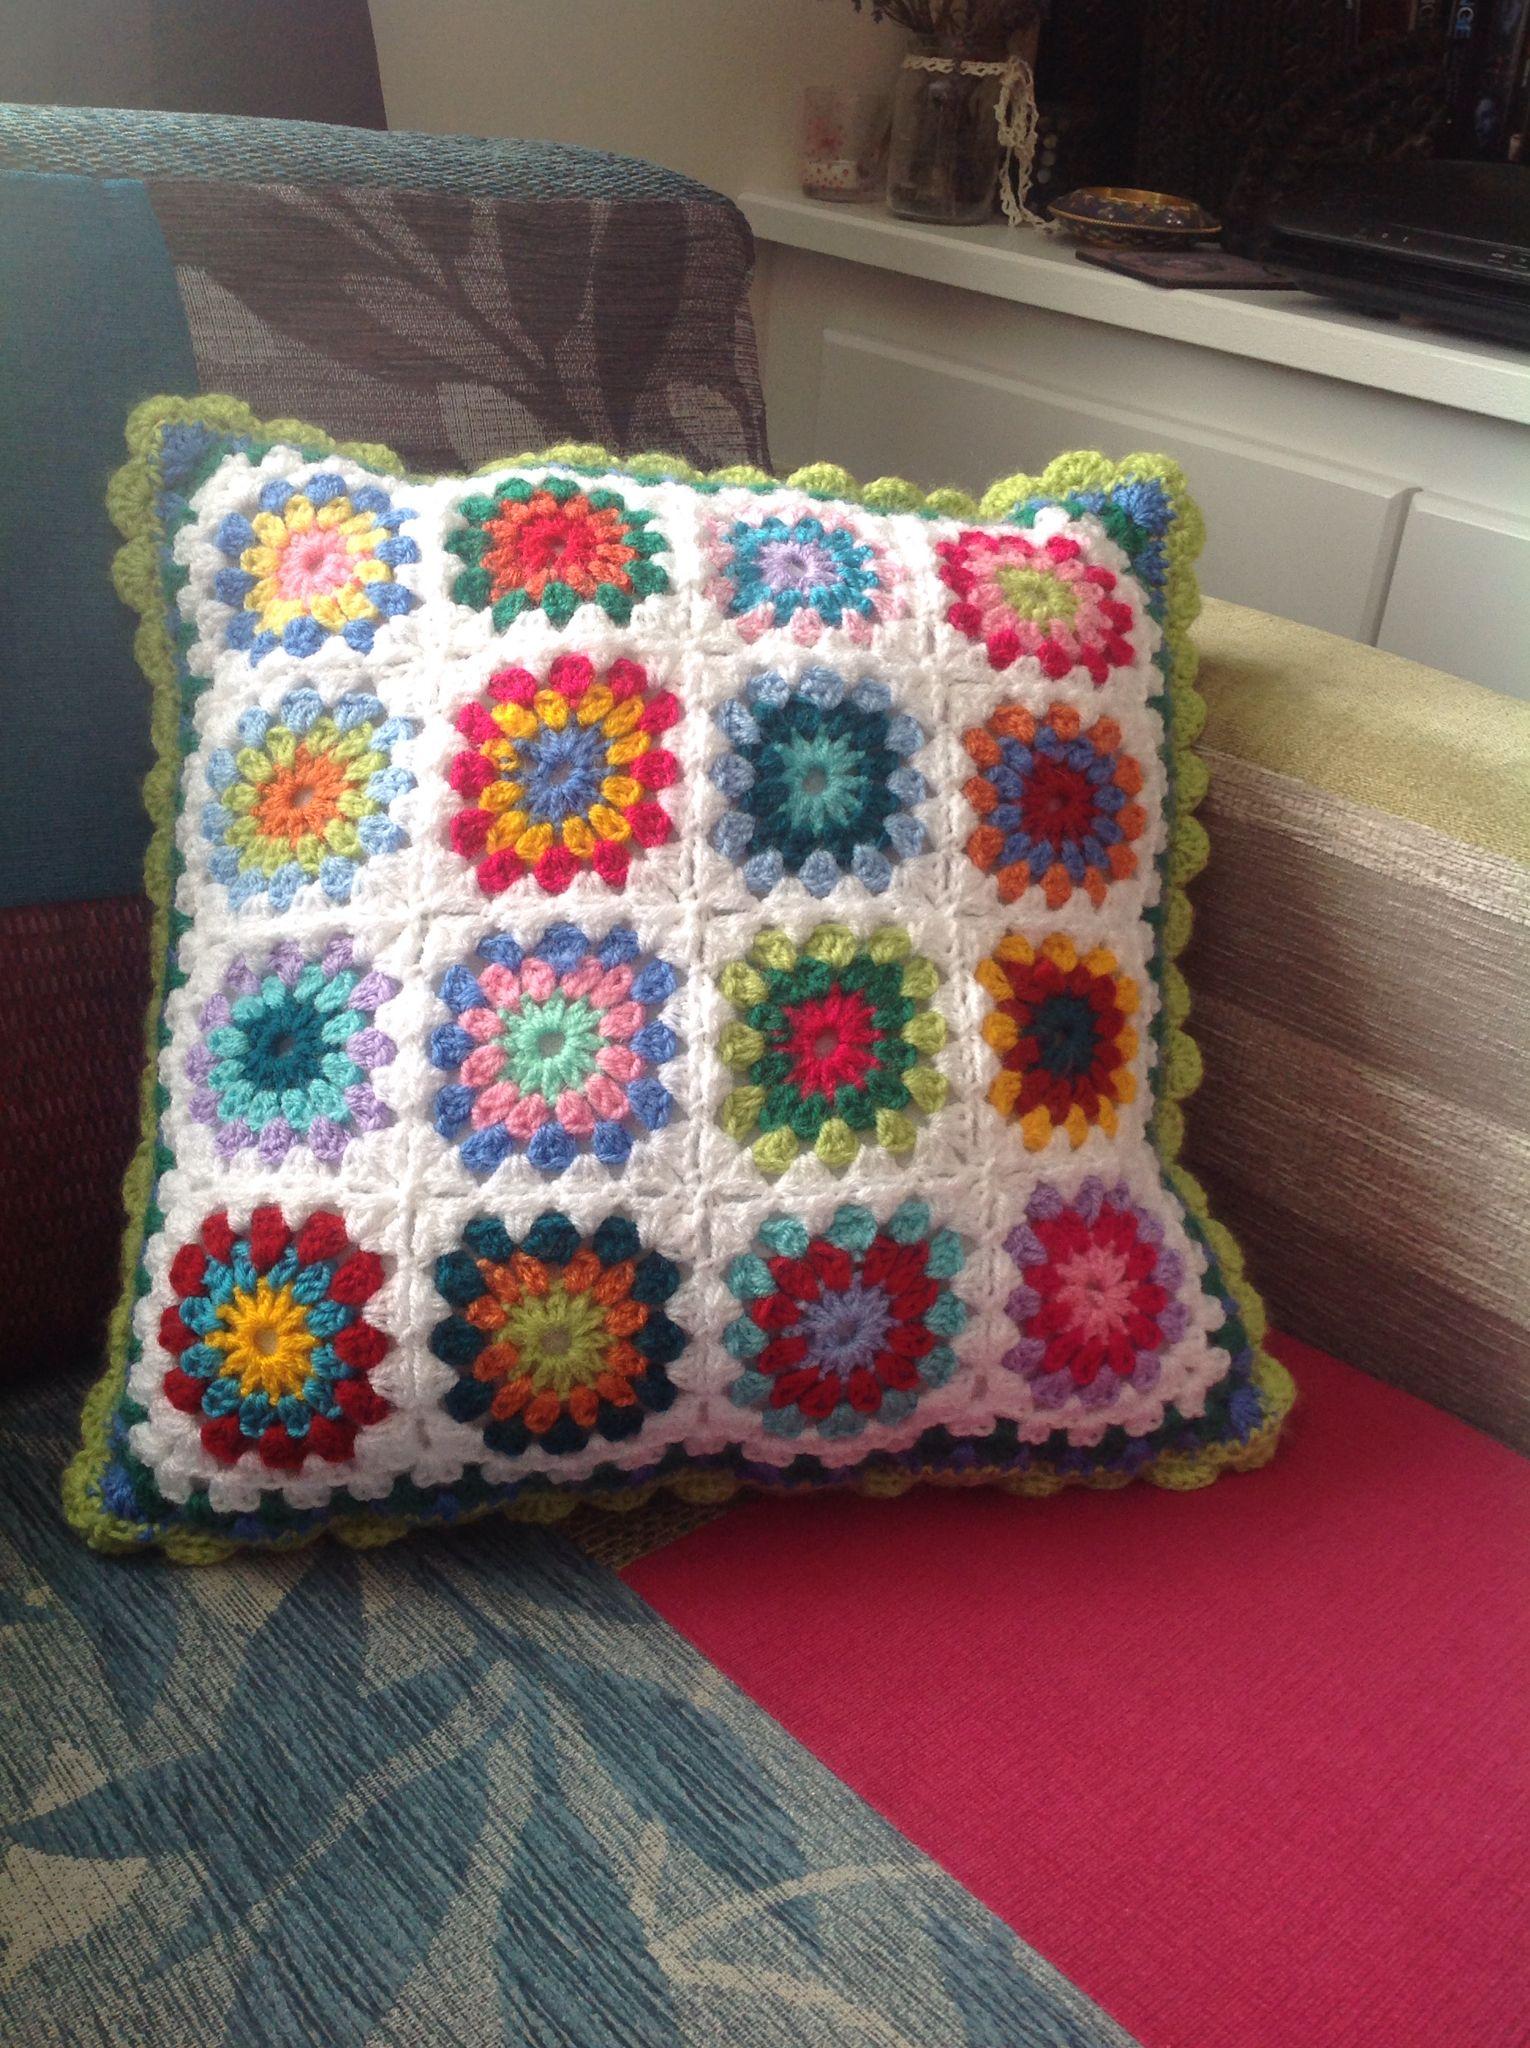 Crocheted sunburst cushion cover - order through my 'Originals' by Jango Facebook page